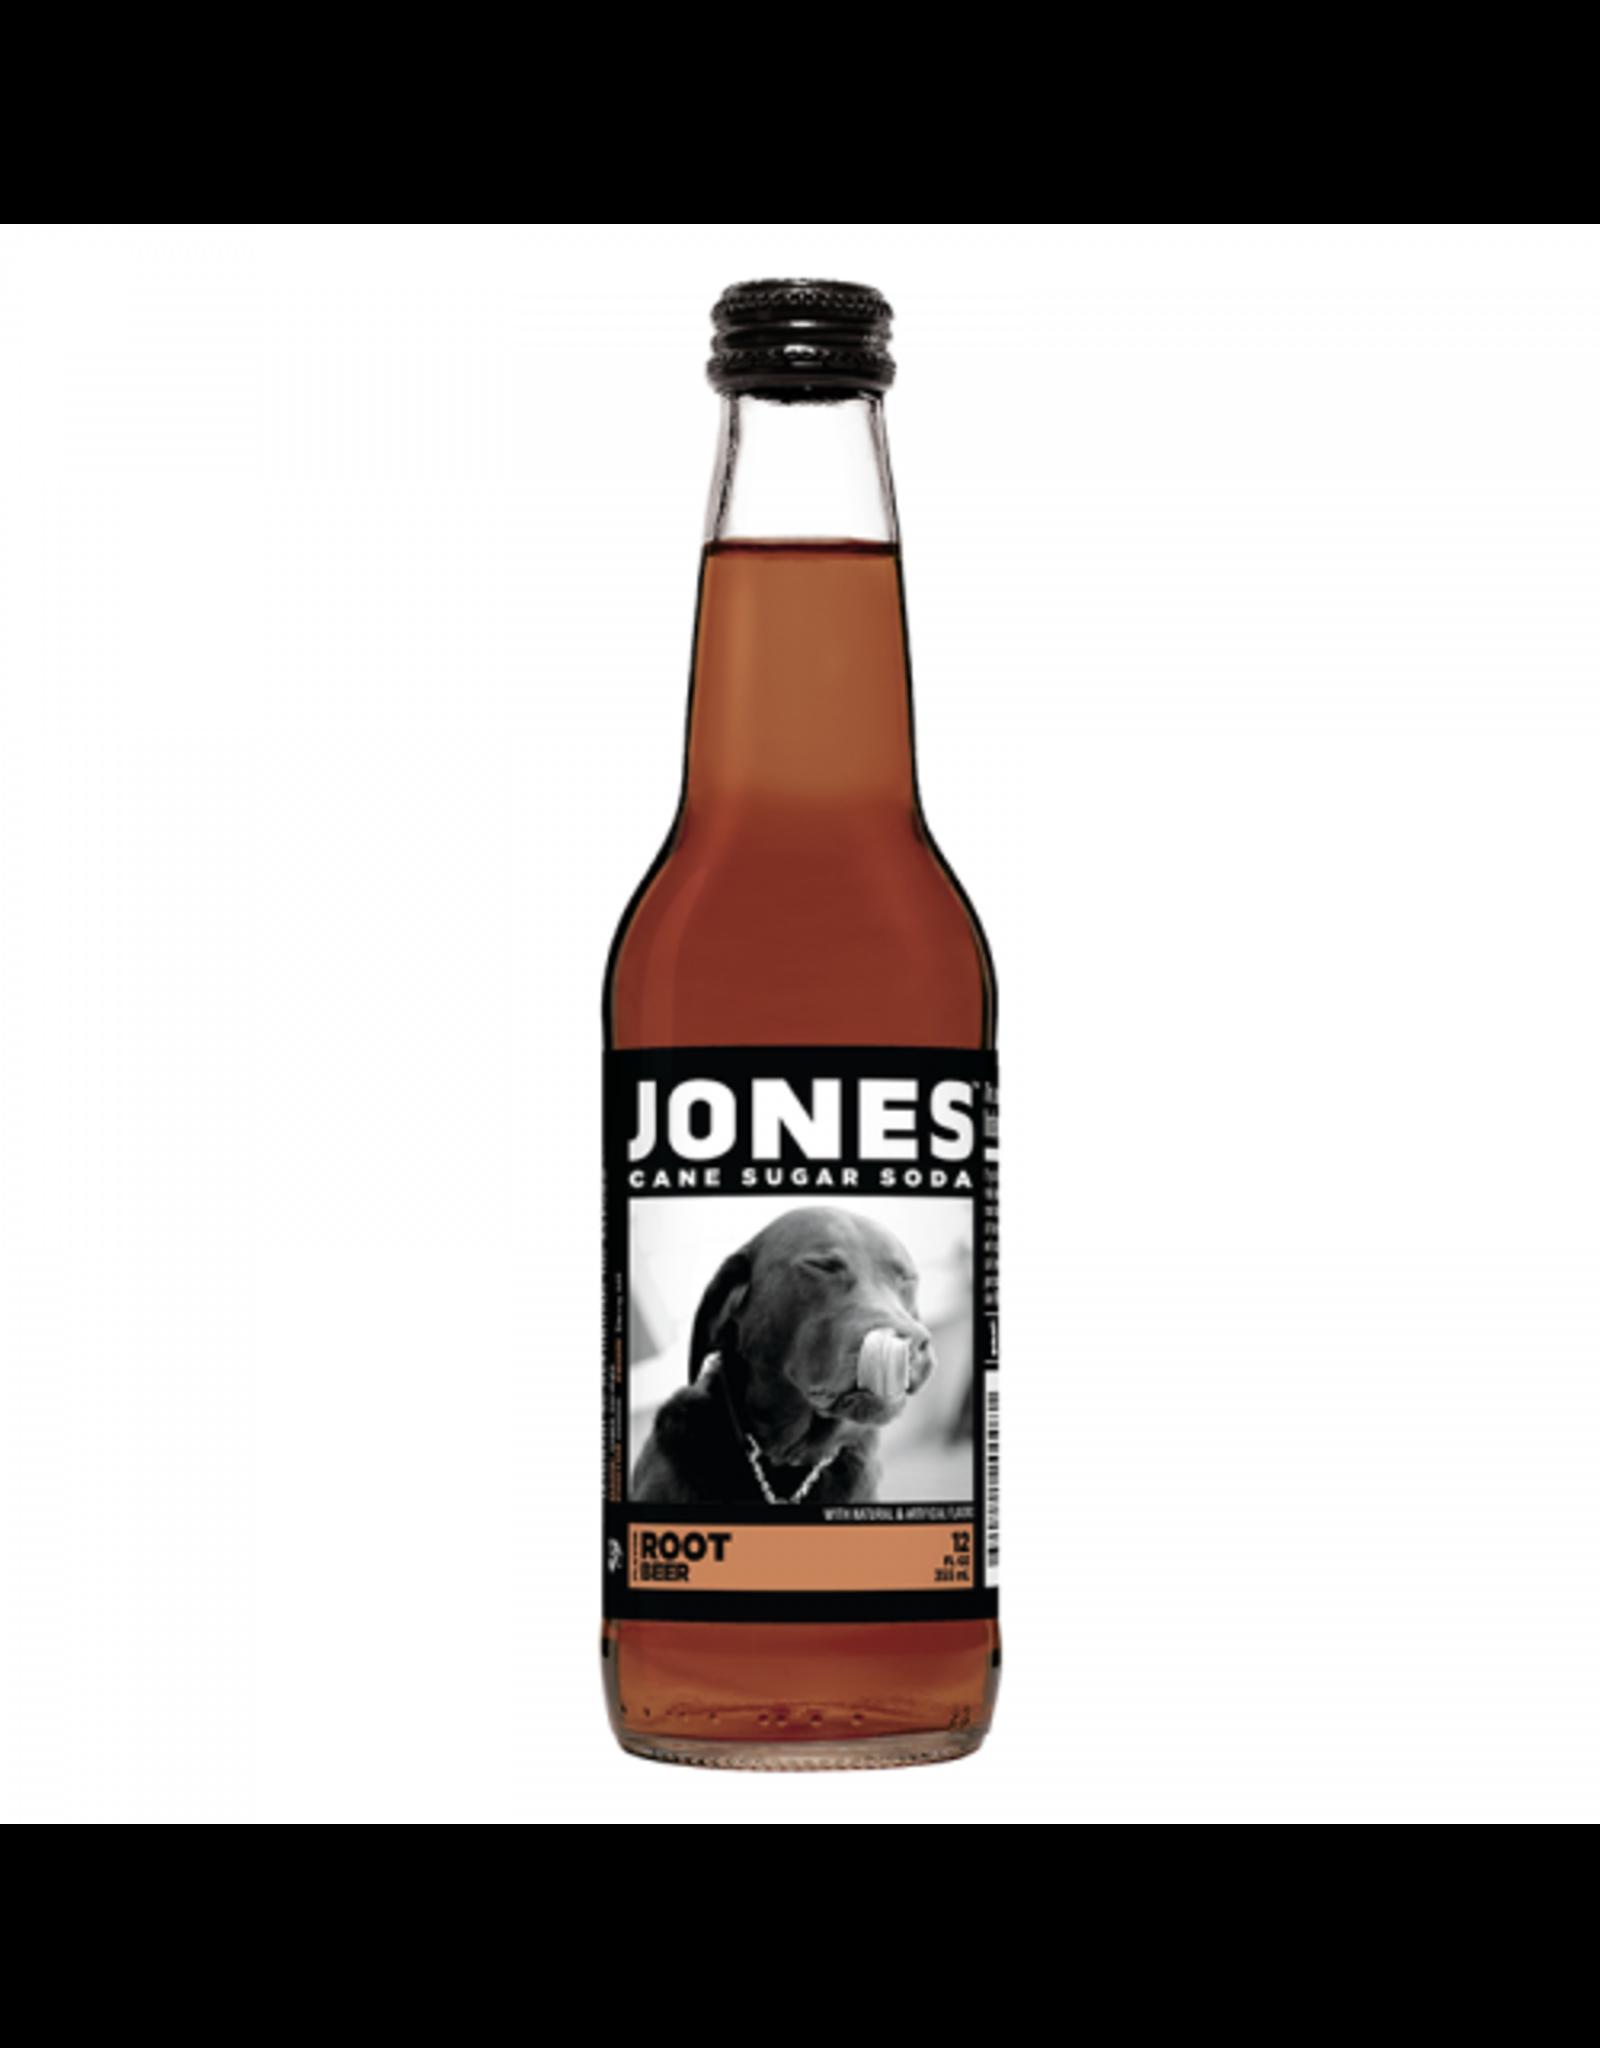 Jones - Root Beer - Cane Sugar Soda - 355ml